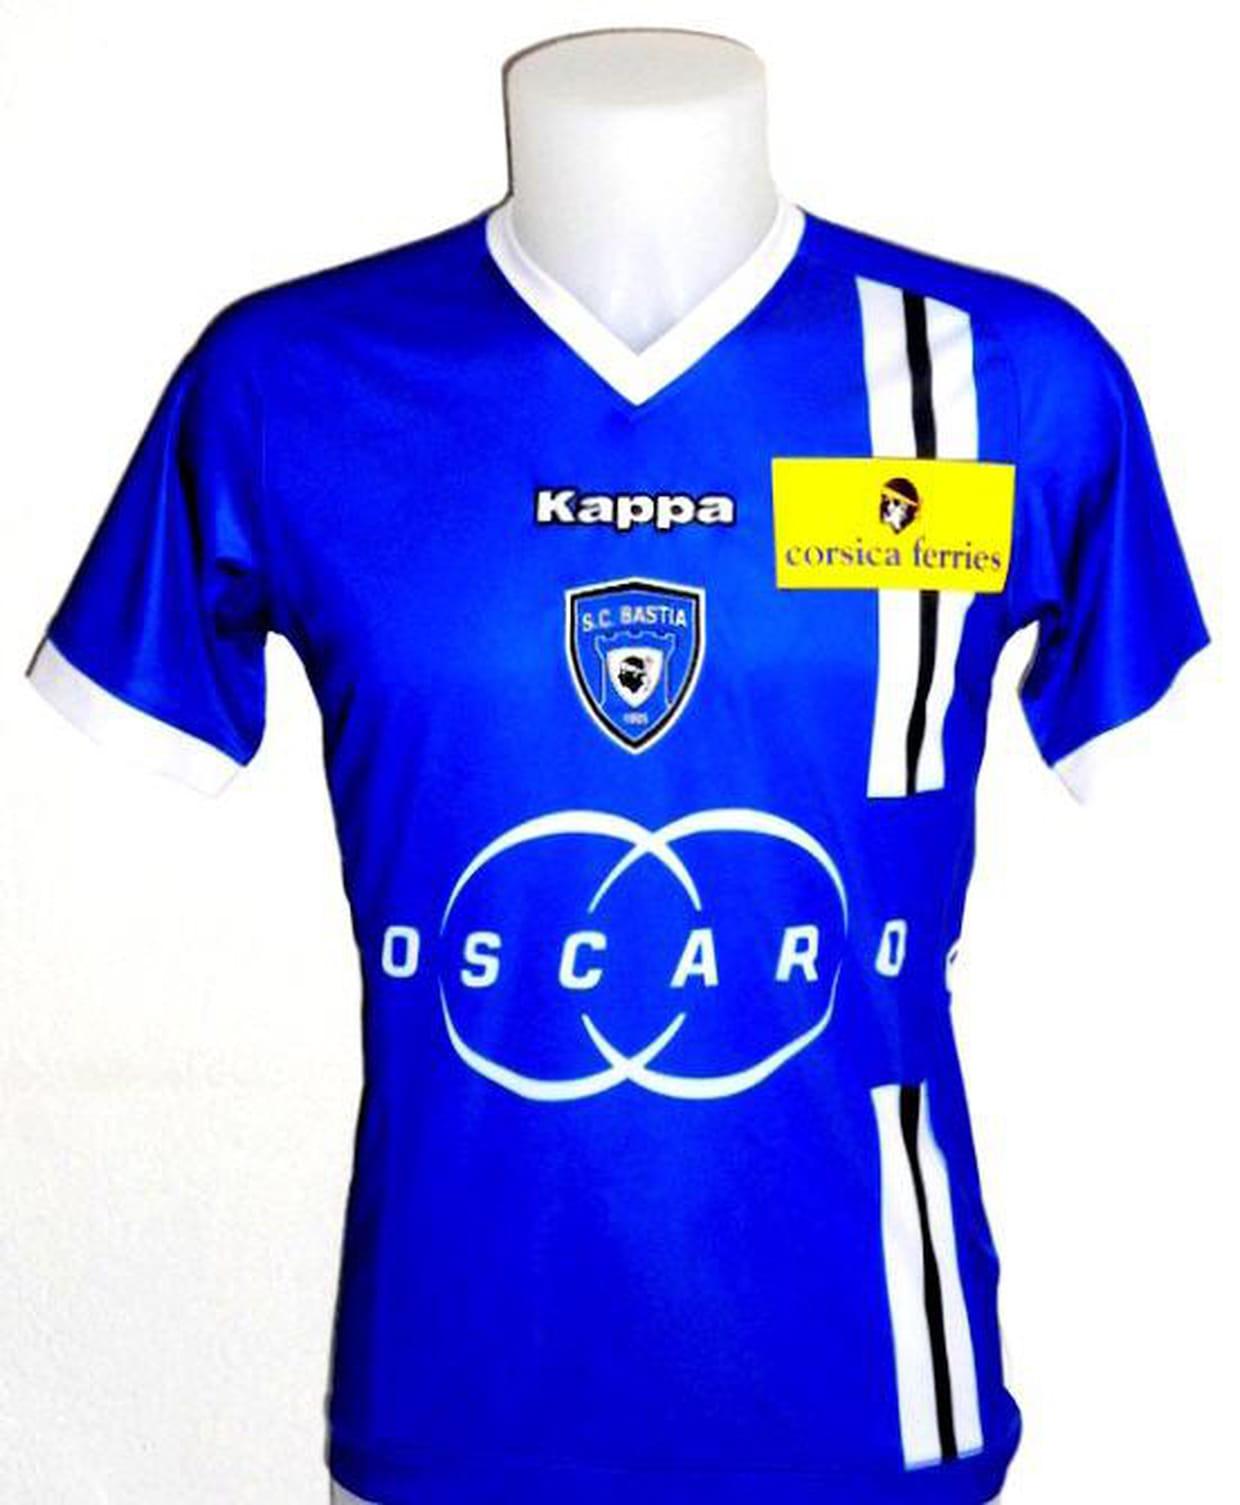 Bastia 0 3 Psg Match Report: SC Bastia